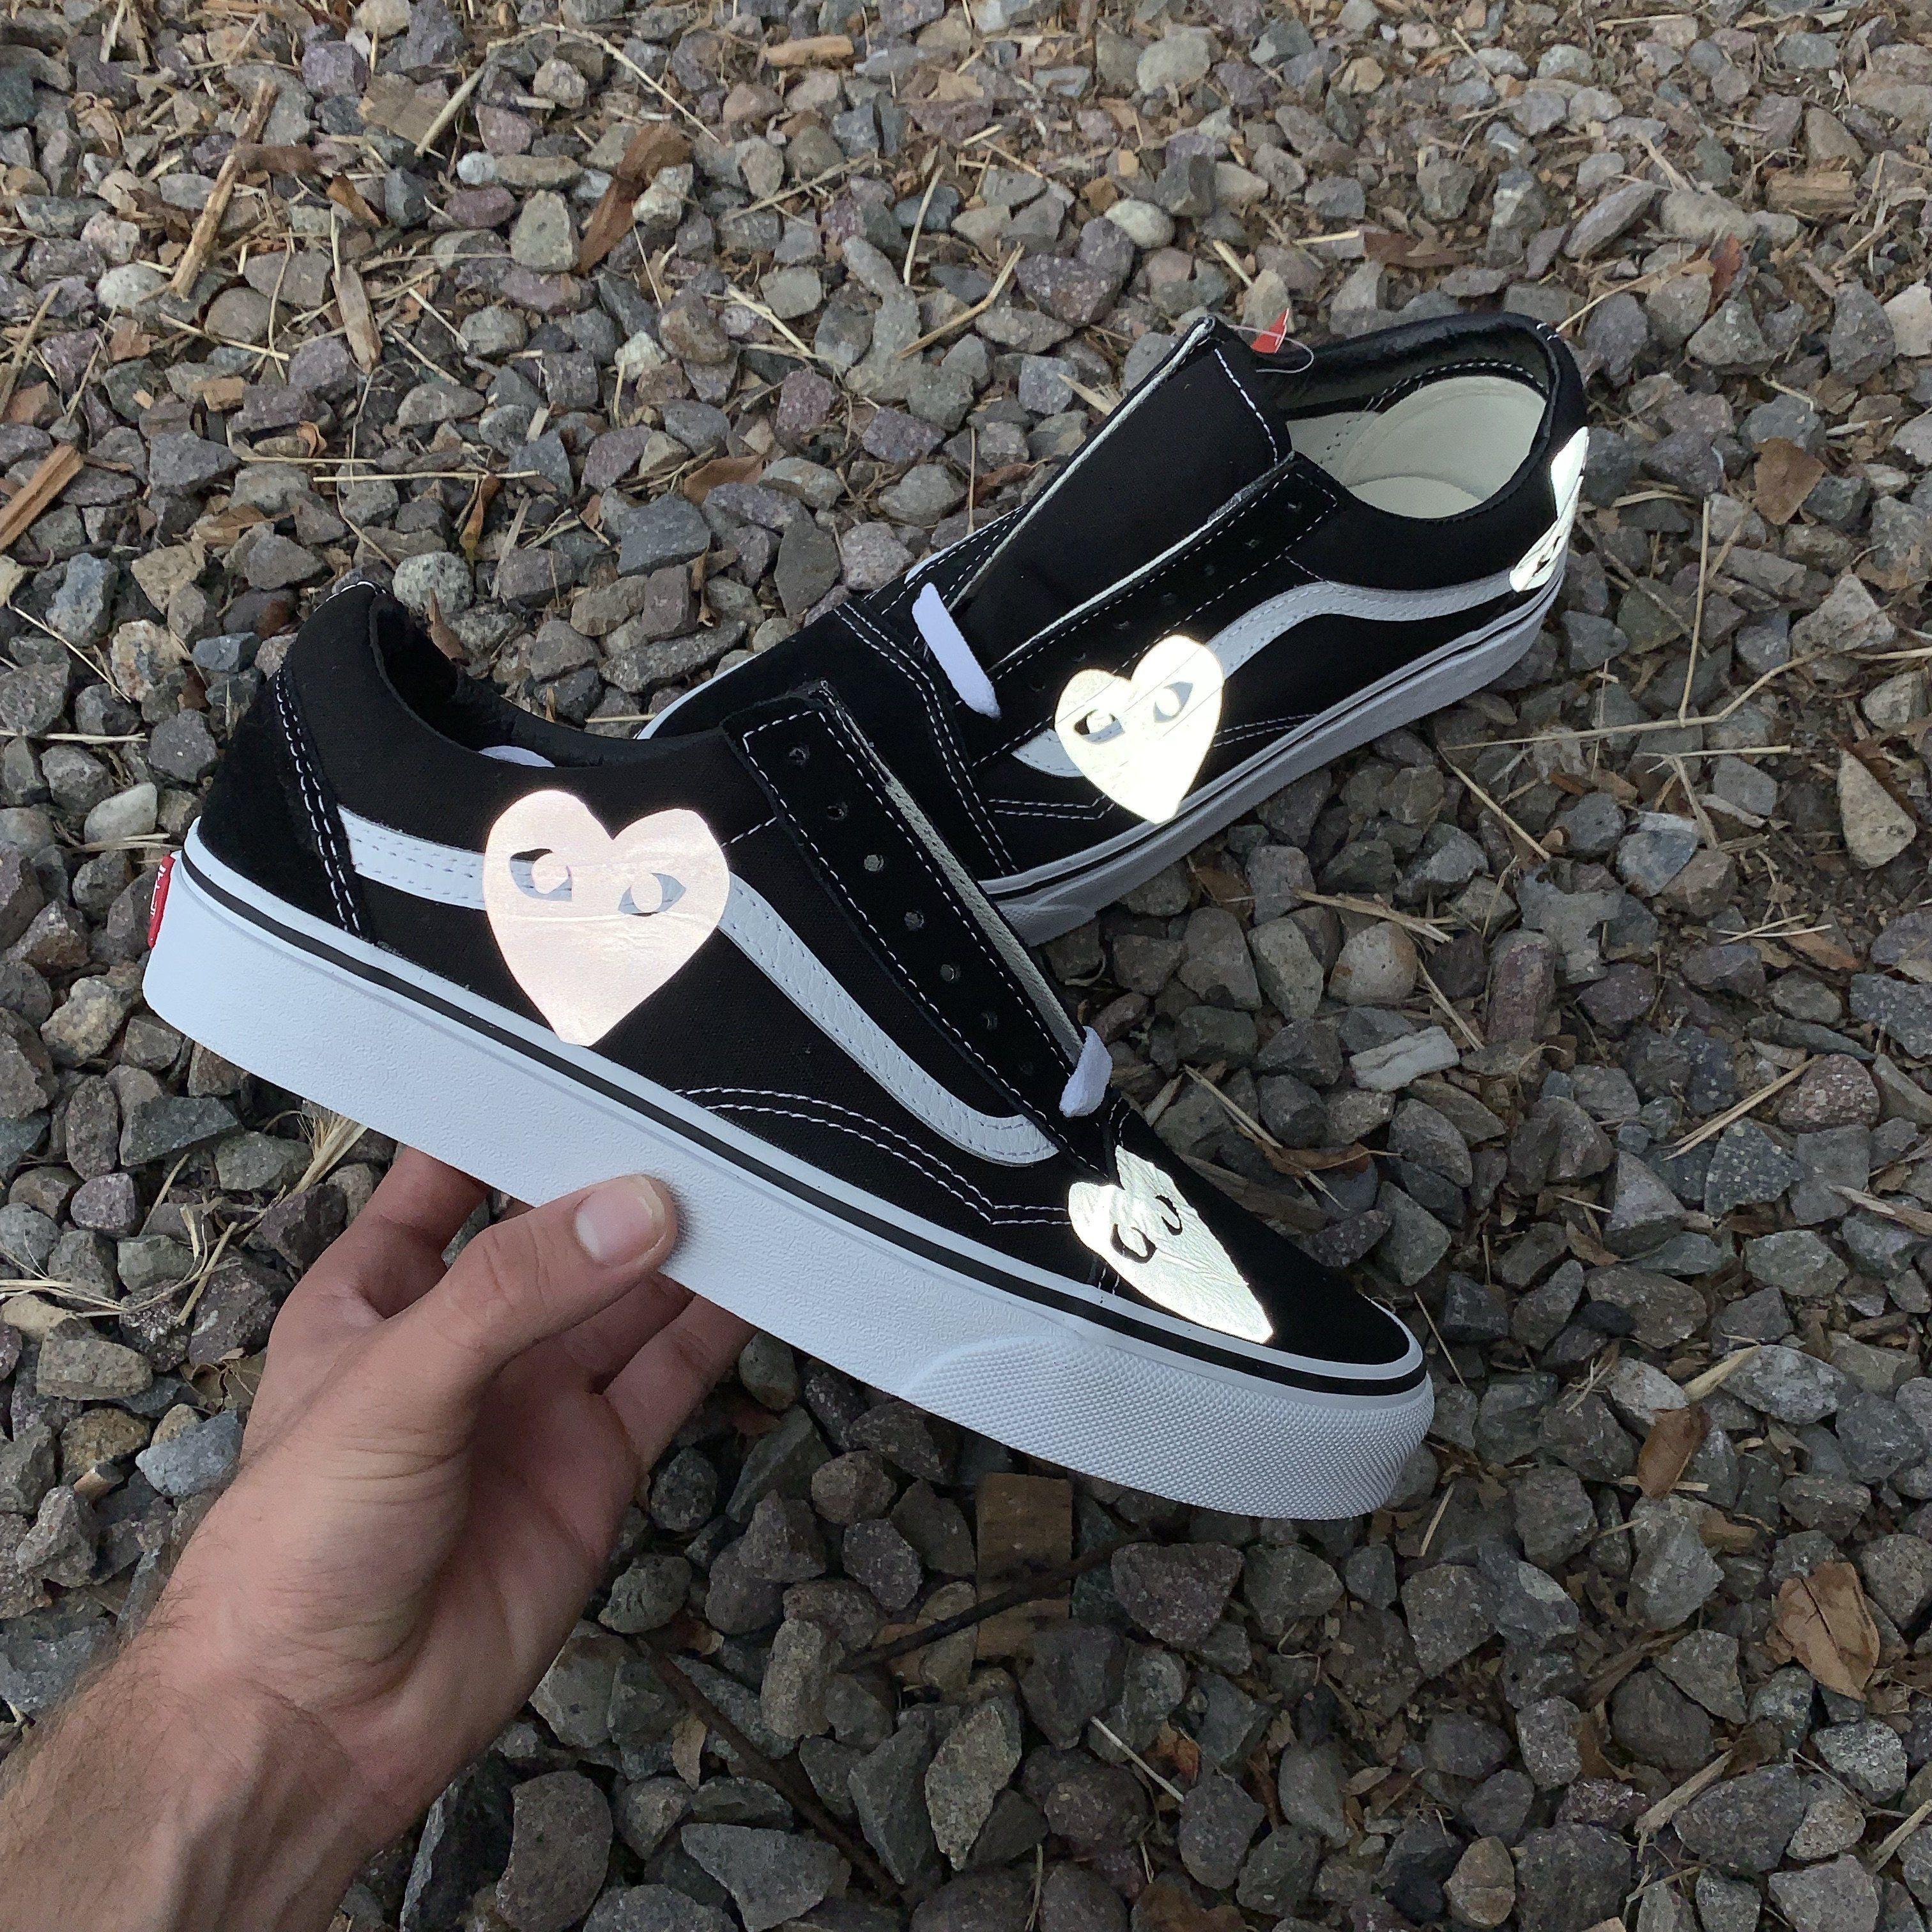 3M Reflective CDG Heart Old Skool Vans